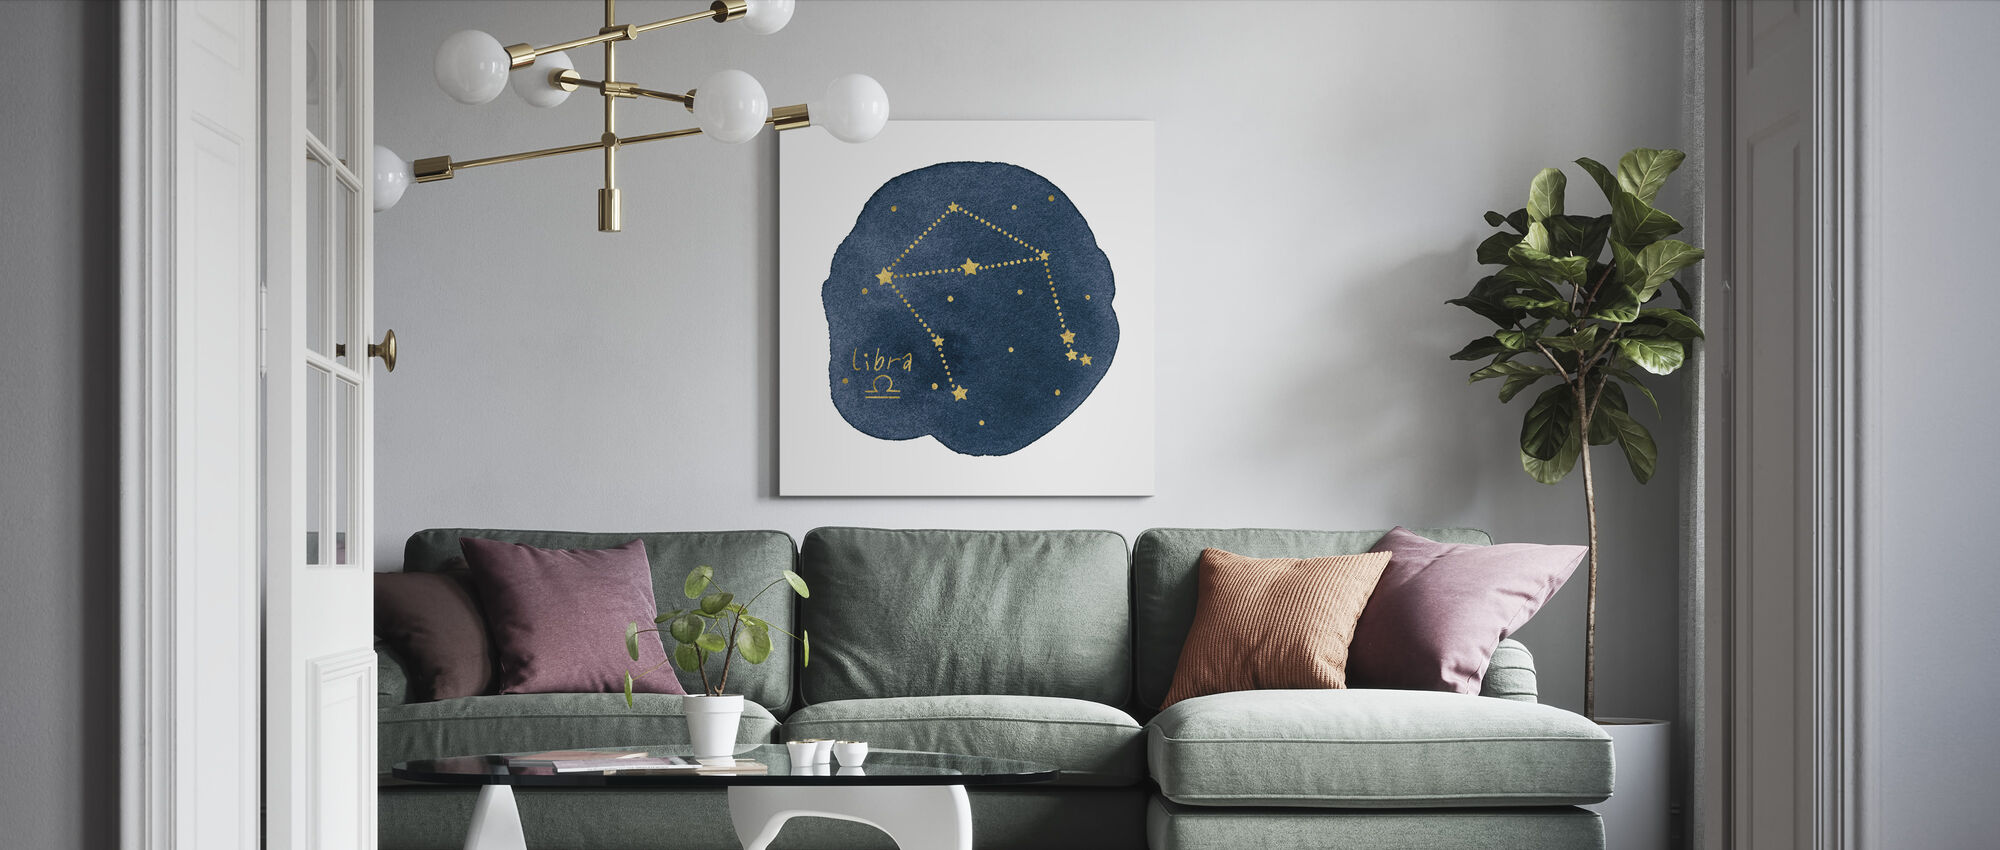 Horoskop Vågen - Canvastavla - Vardagsrum